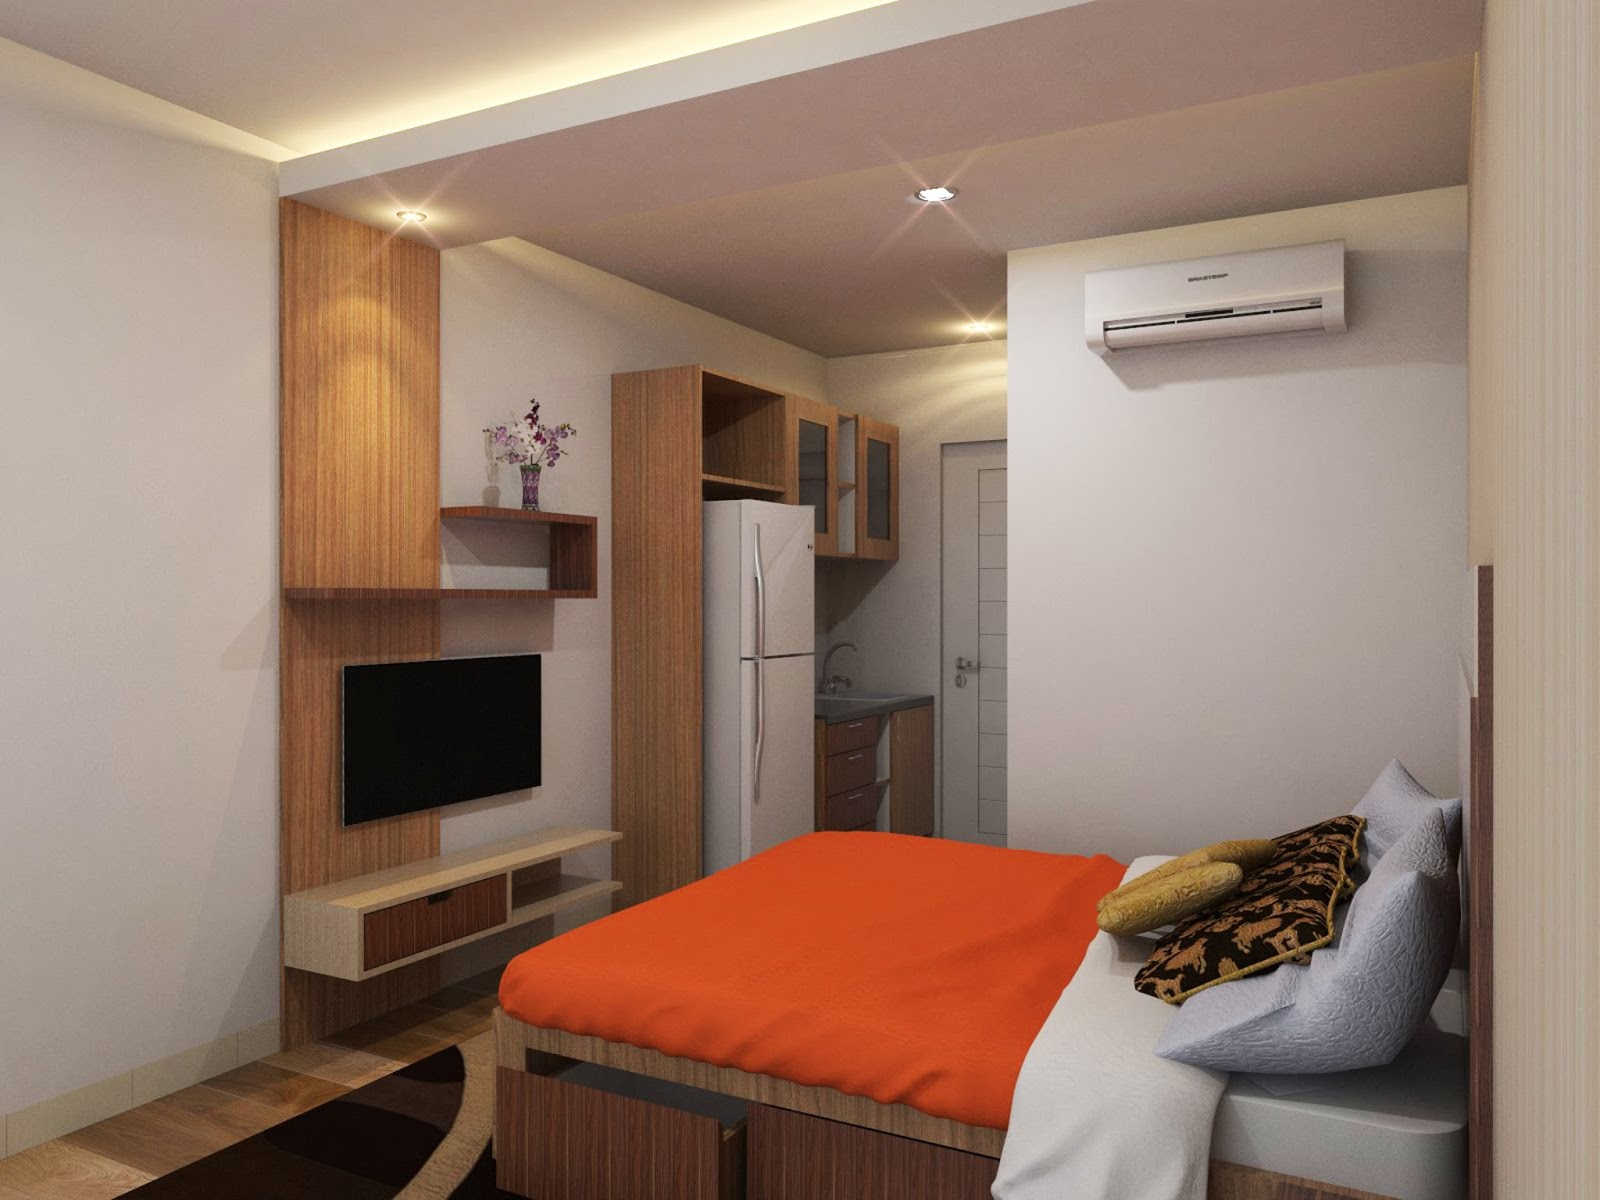 Top 28 design interior apartemen design interior for Design apartemen 2 kamar